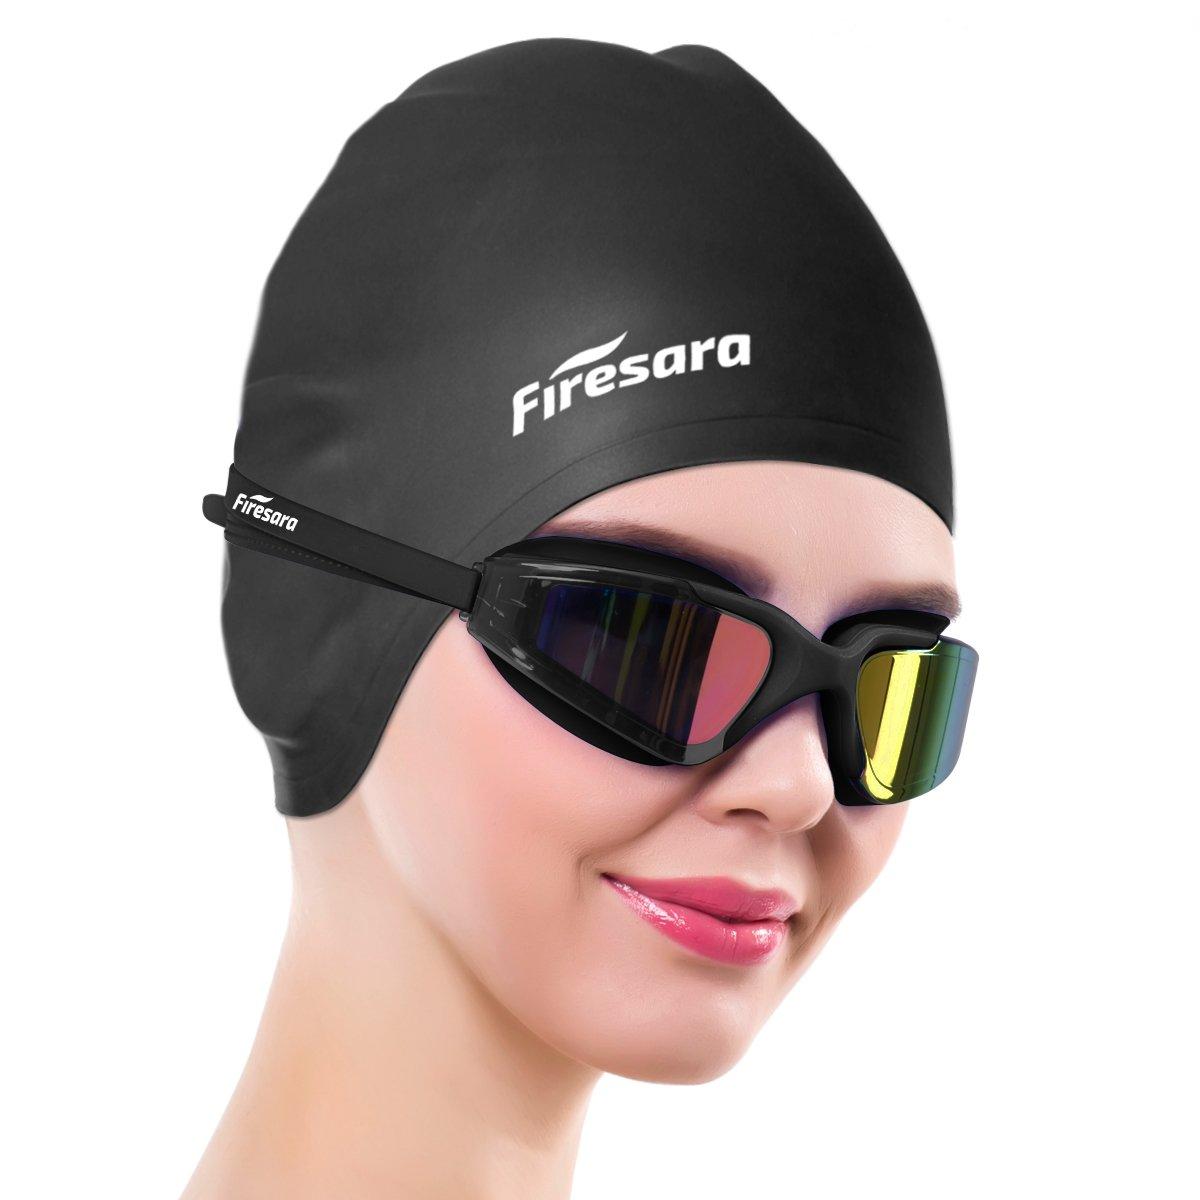 977e9612094c firesara Swim Cap Swim Goggles